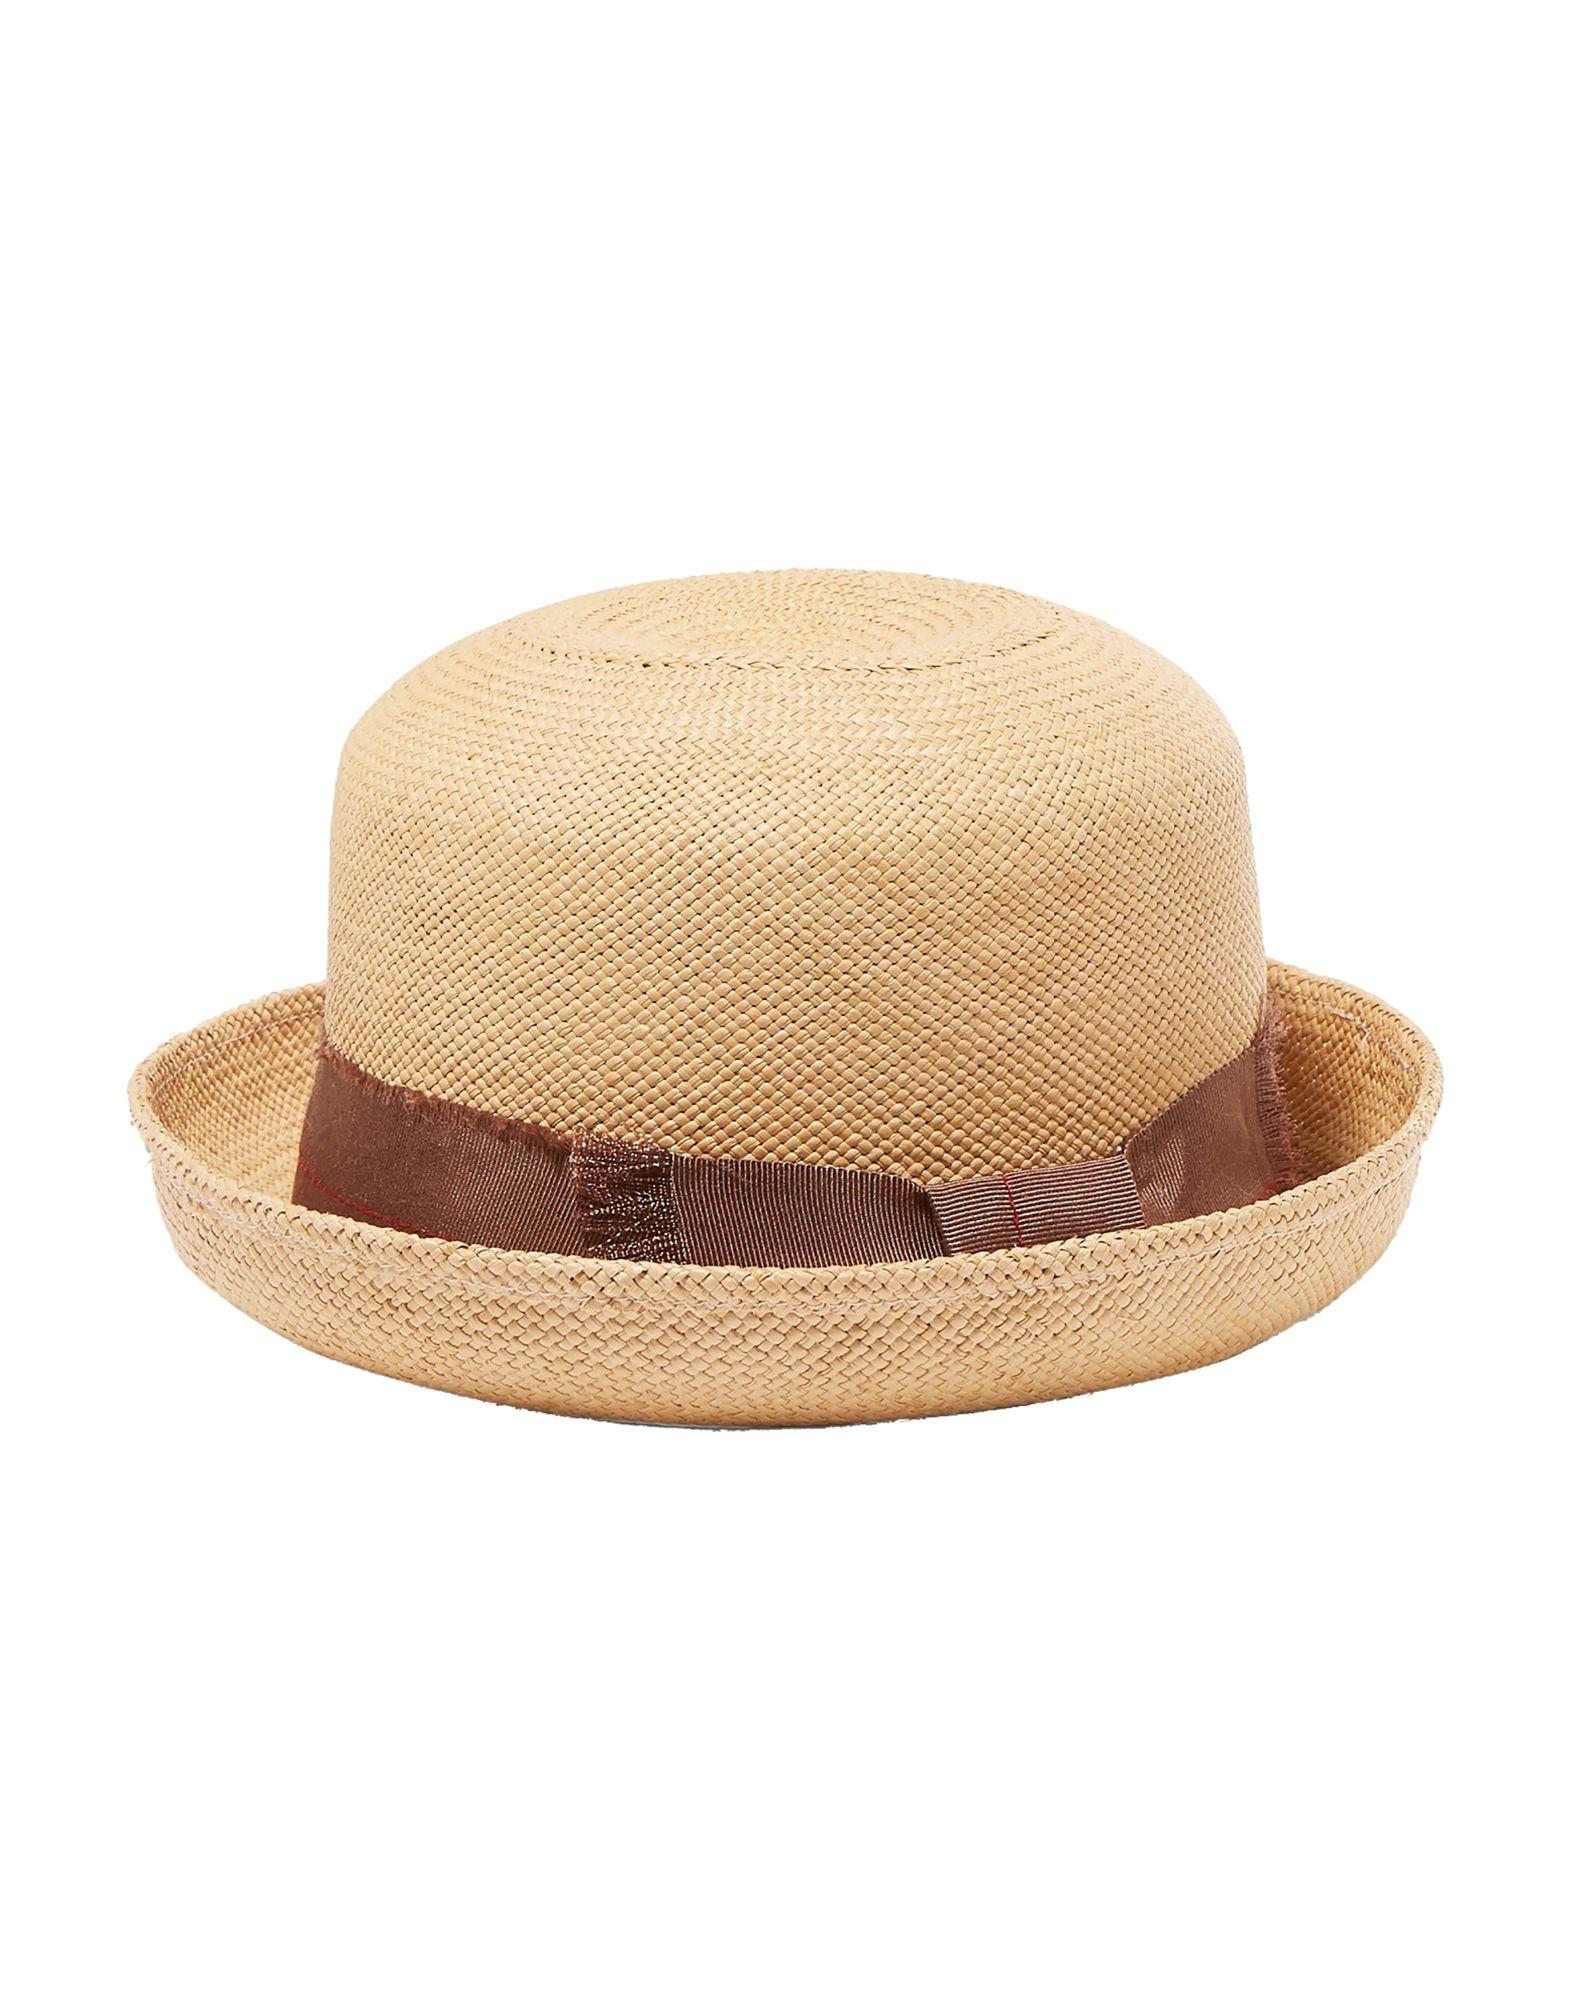 0a11abee7ecc Sensi Studio Hat - Women Sensi Studio Hats online on YOOX Portugal ...